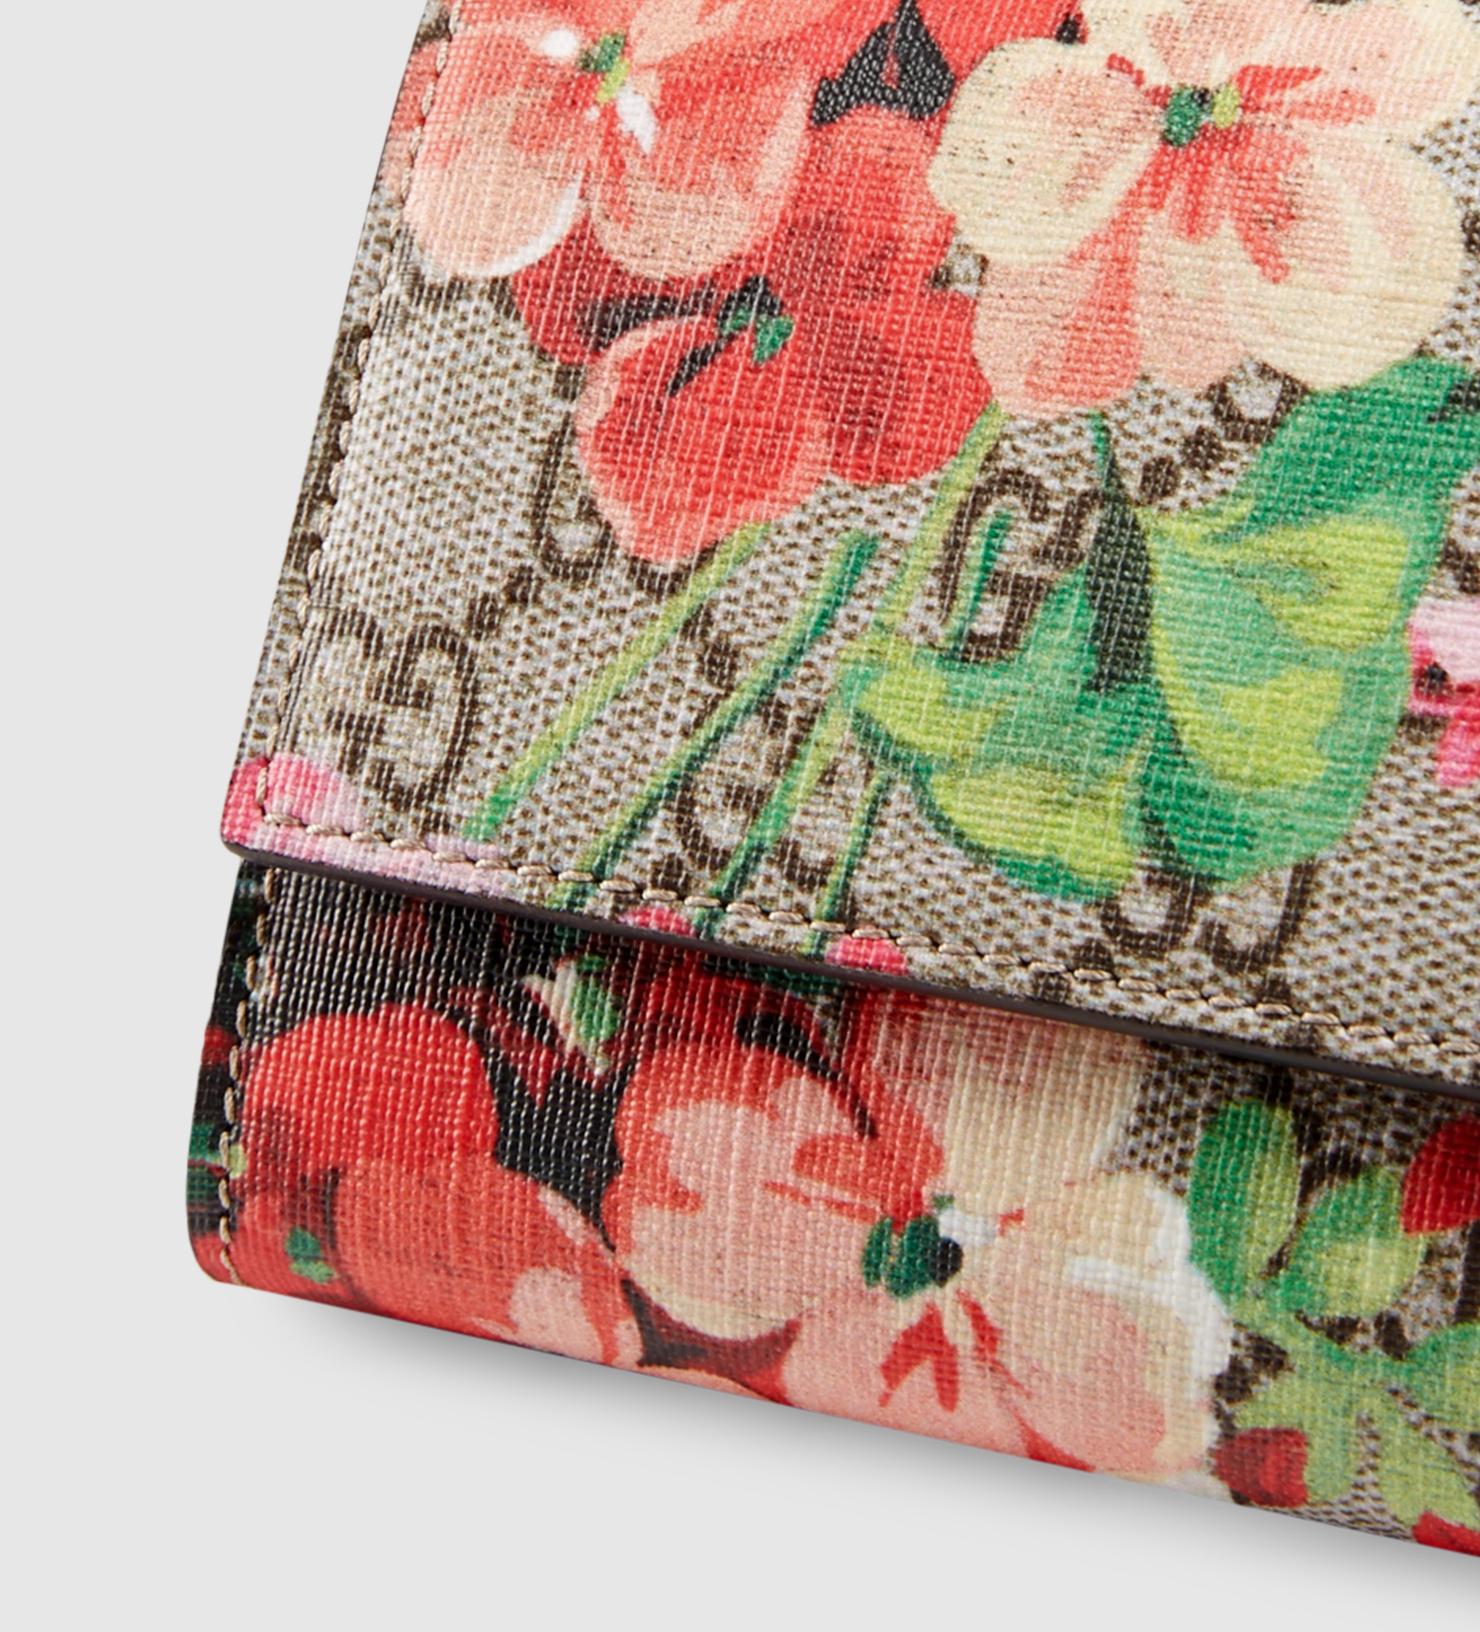 0bfd21dd56cbf8 Gucci Gg Blooms Pouch In Multicolor GG Supreme Canvas Blooms Lyst